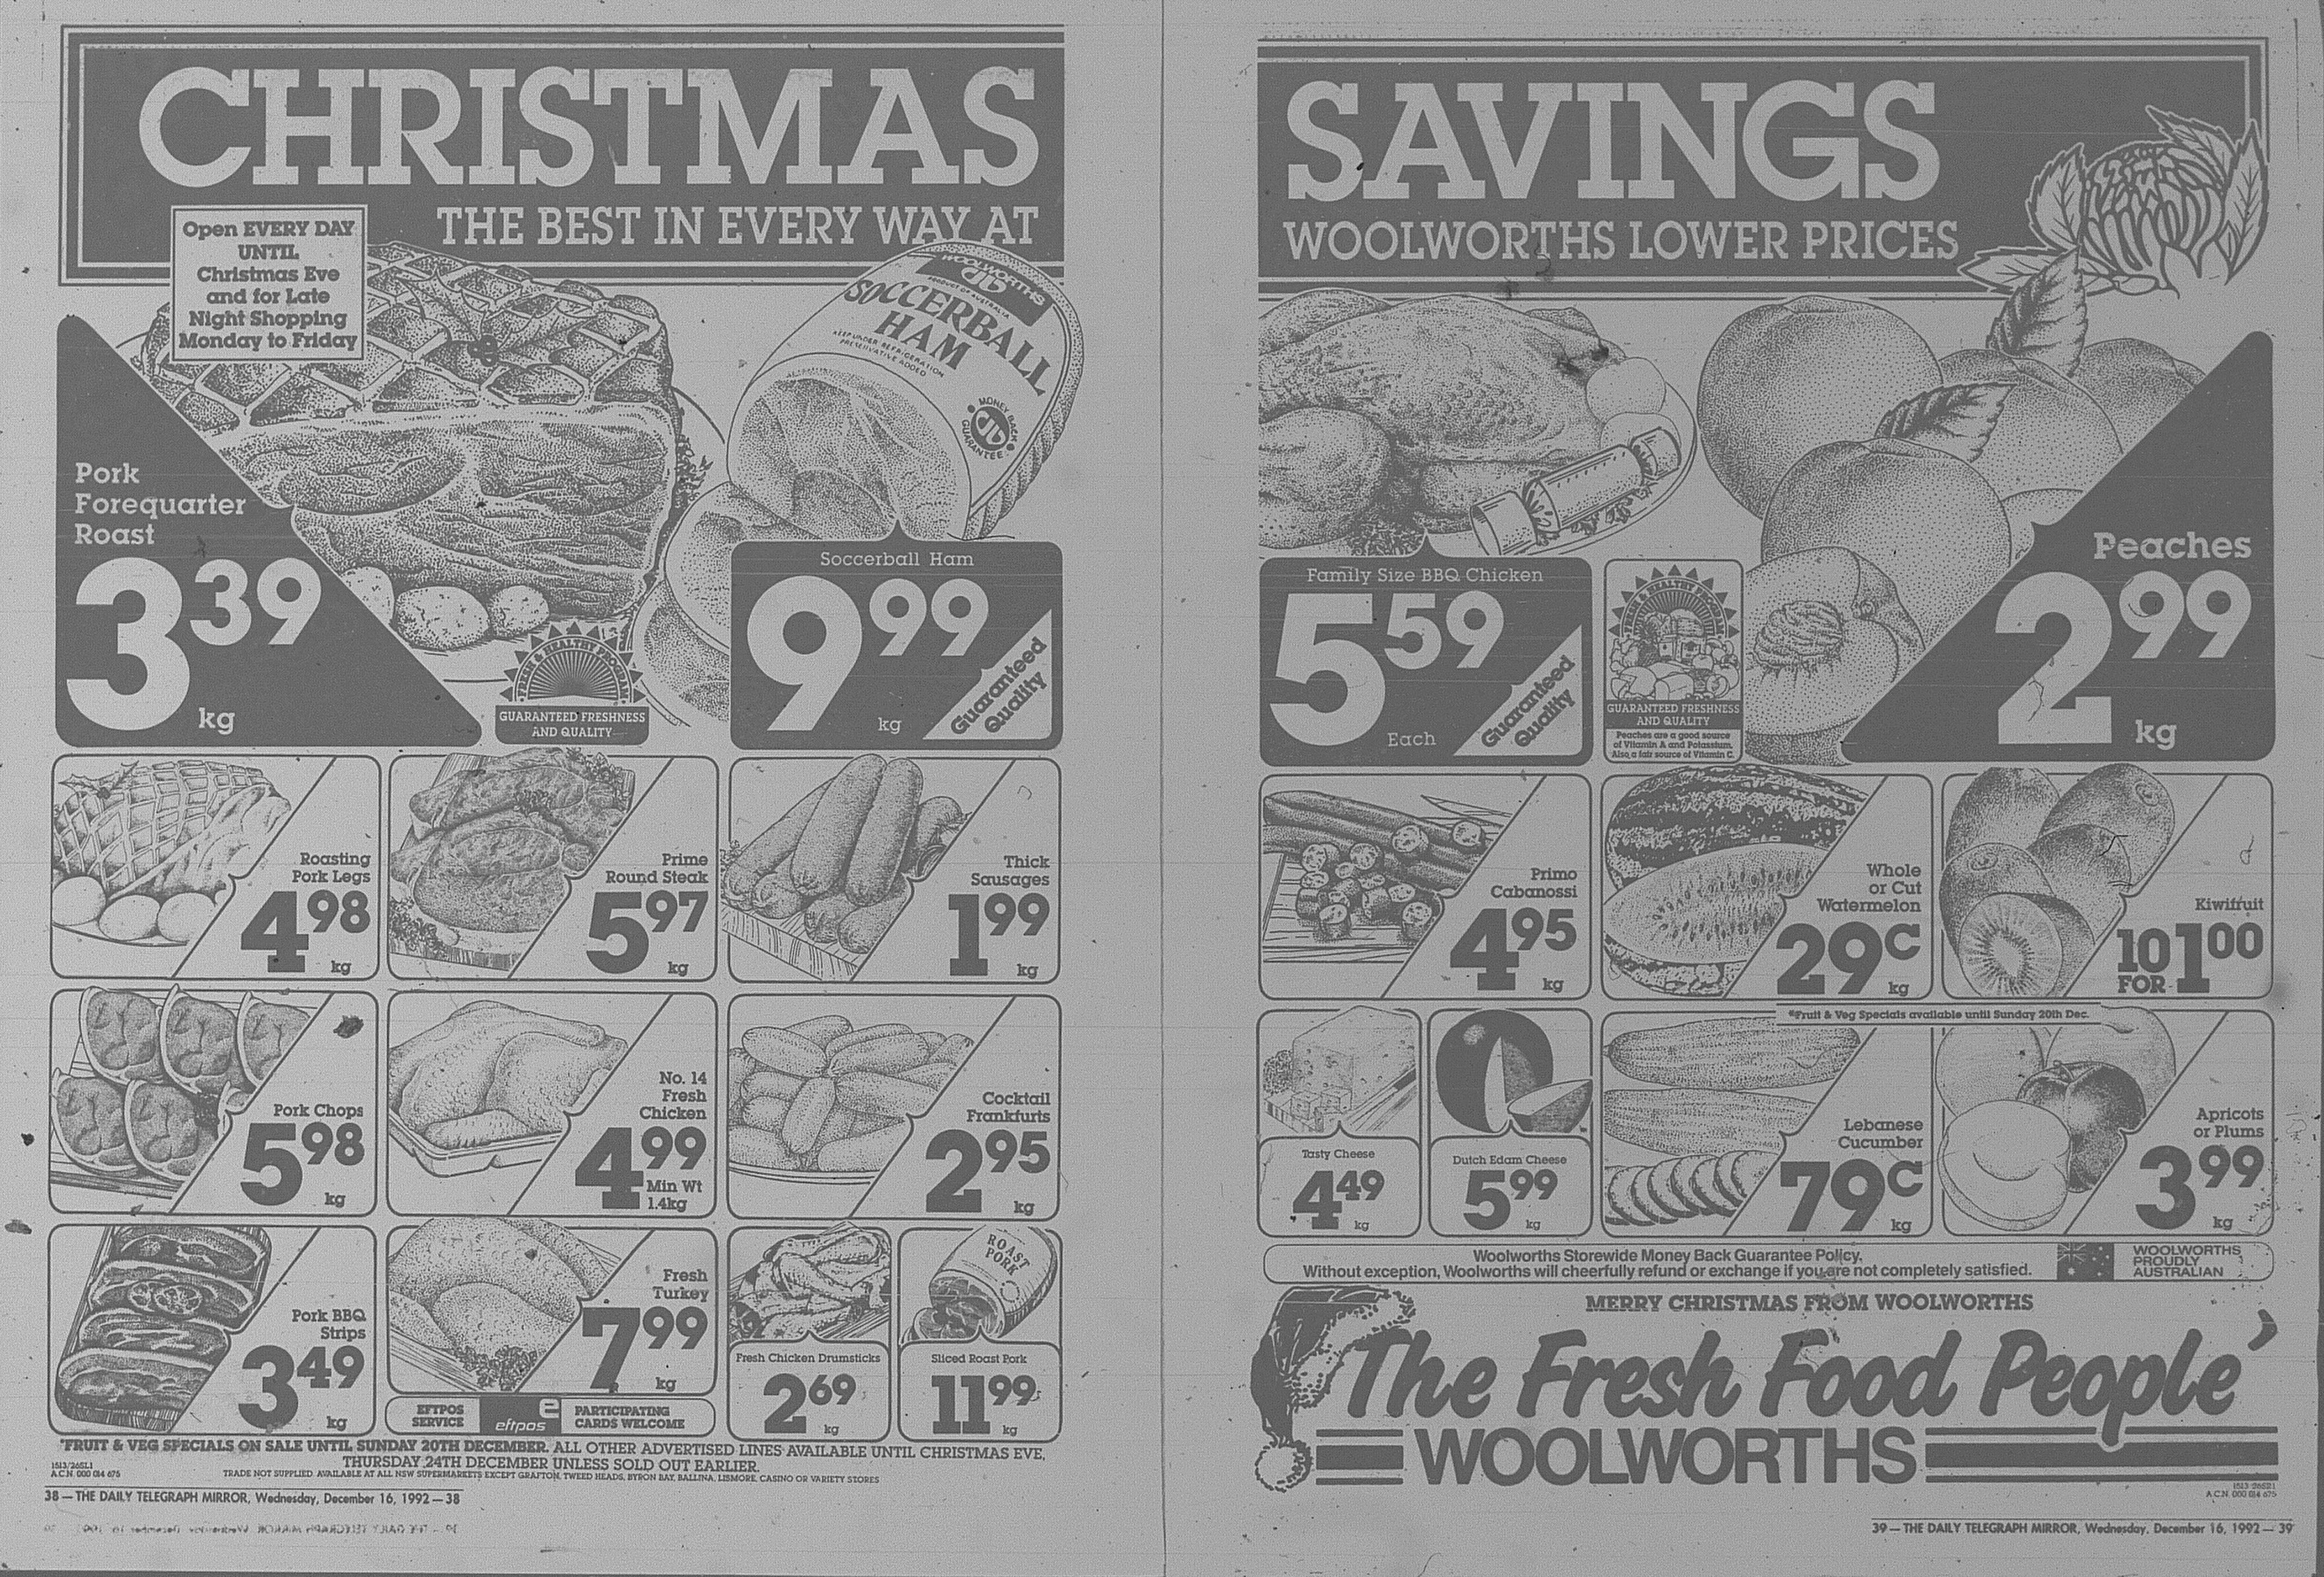 December 1992 daily telegraph 0006 (2)